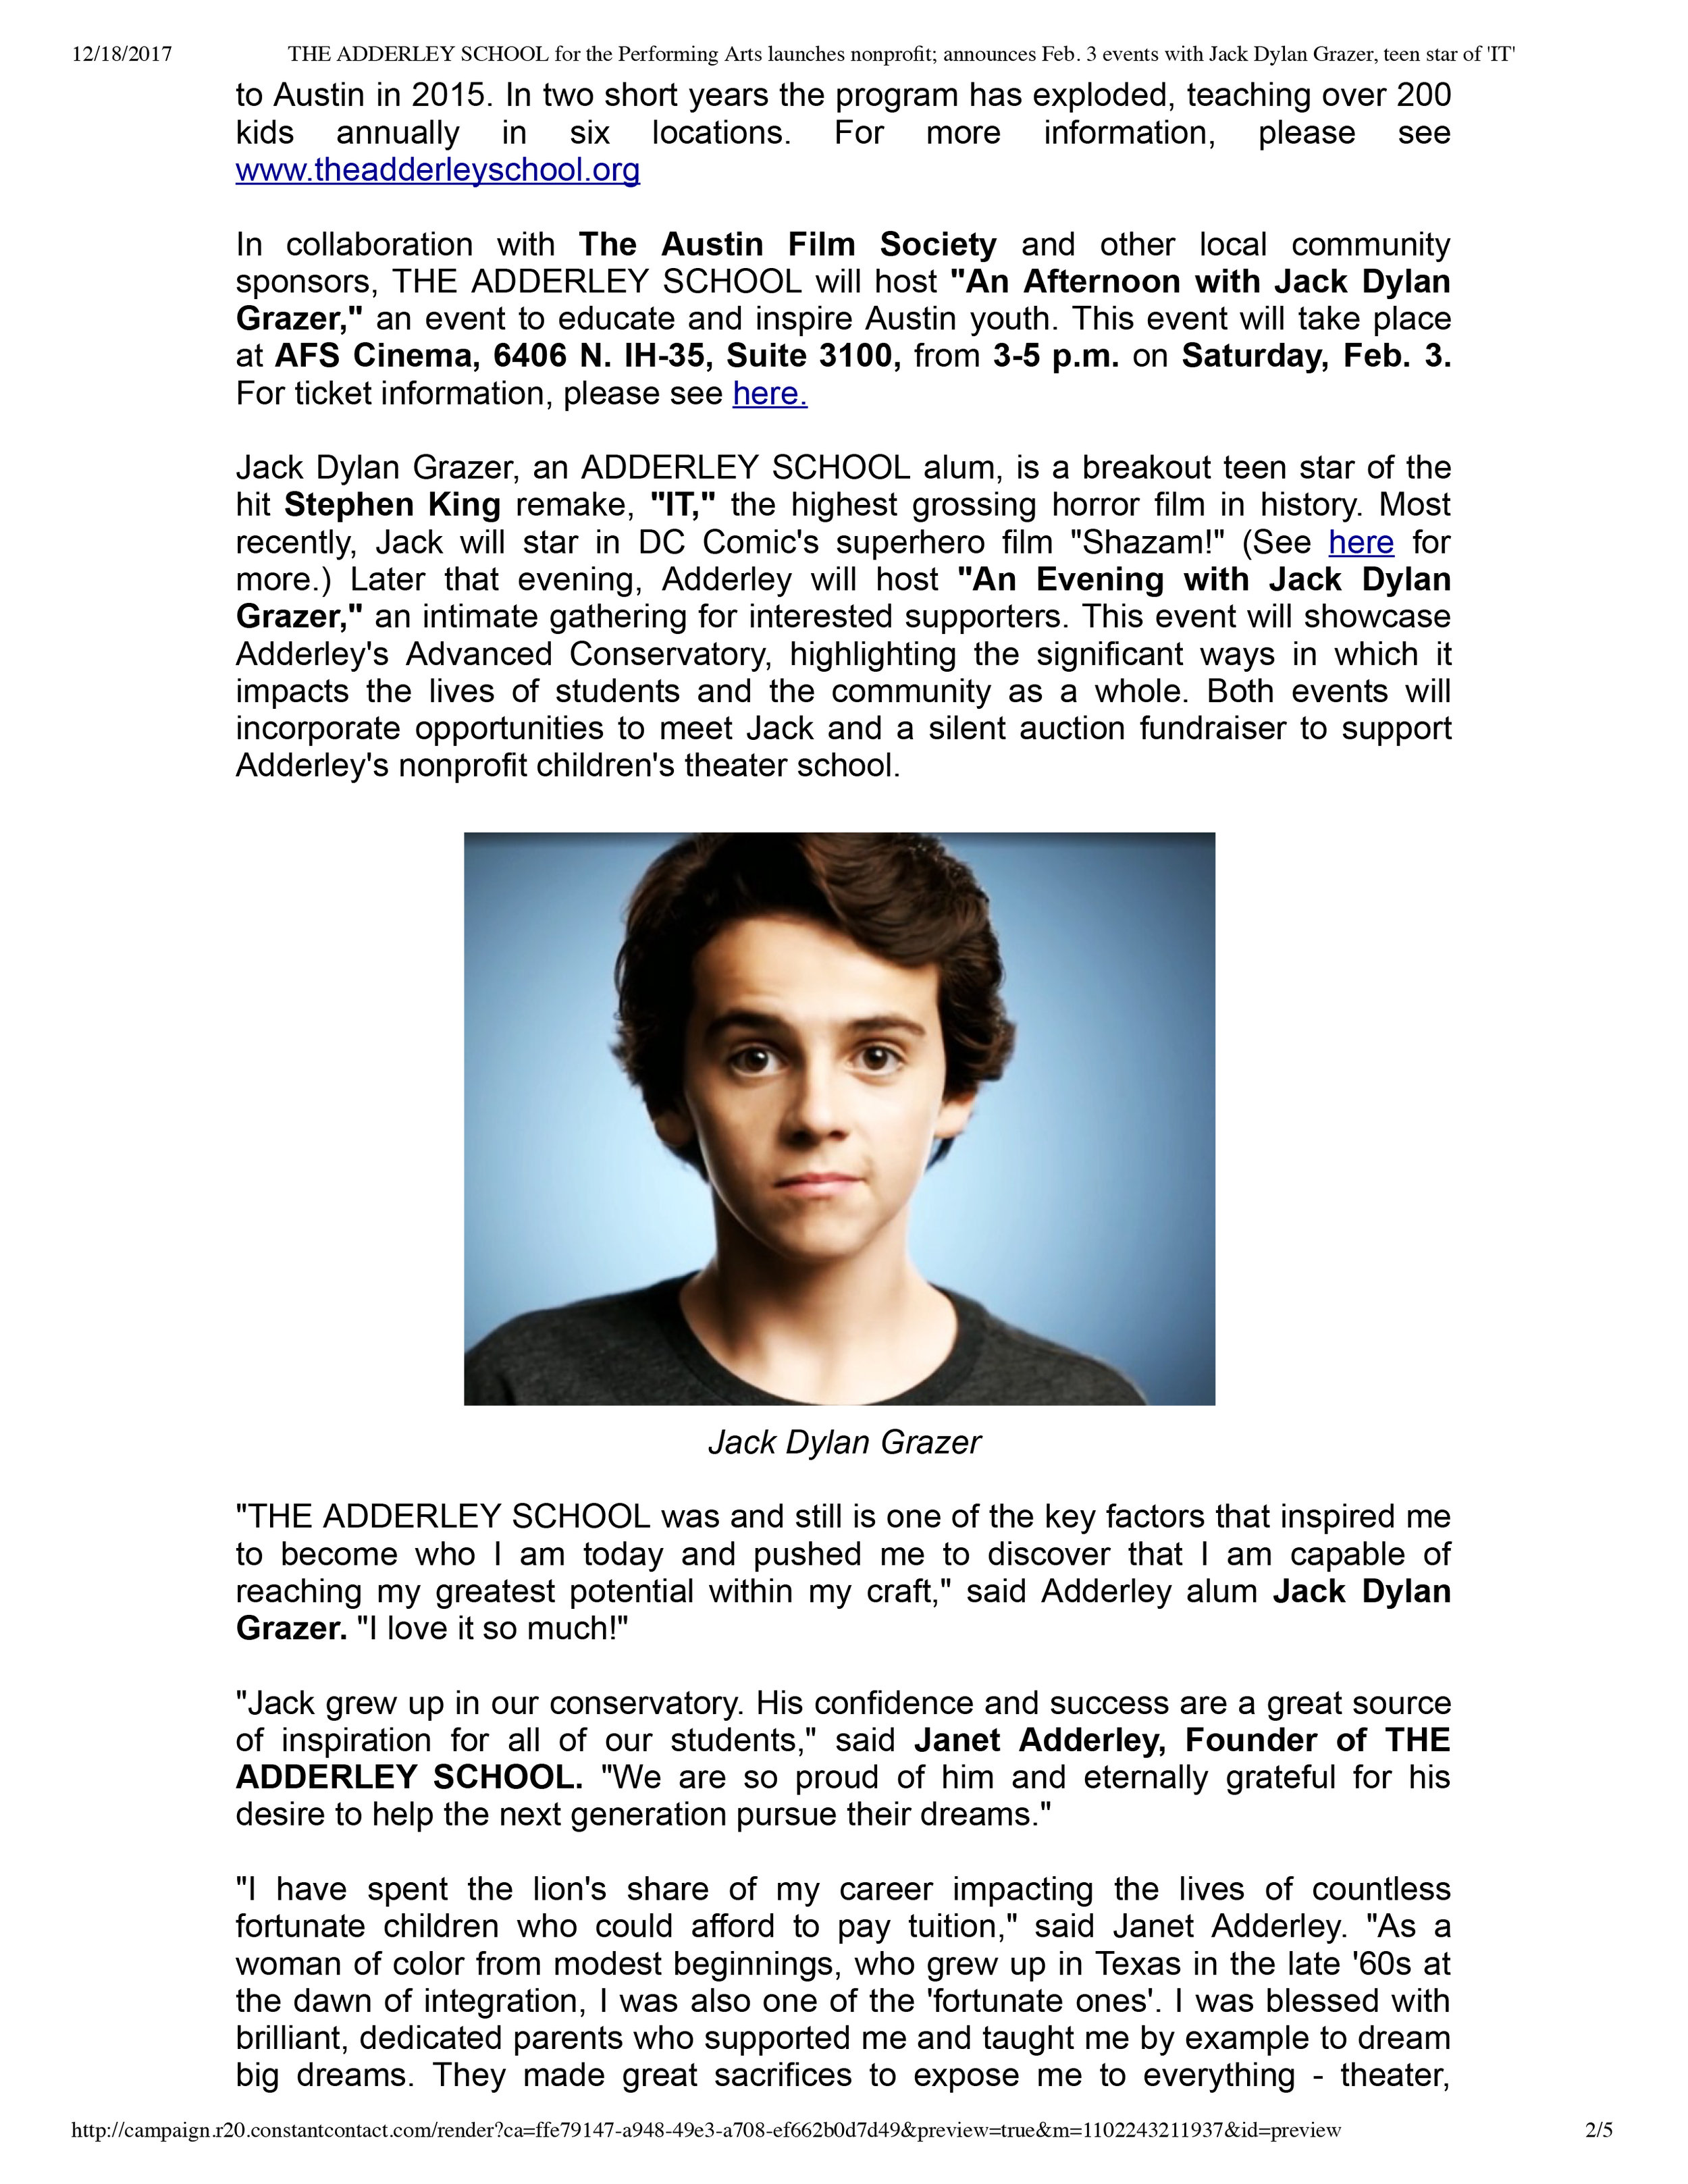 THE ADDERLEY SCHOOL for the Performing ...h Jack Dylan Grazer, teen star of 'IT'-2.jpg